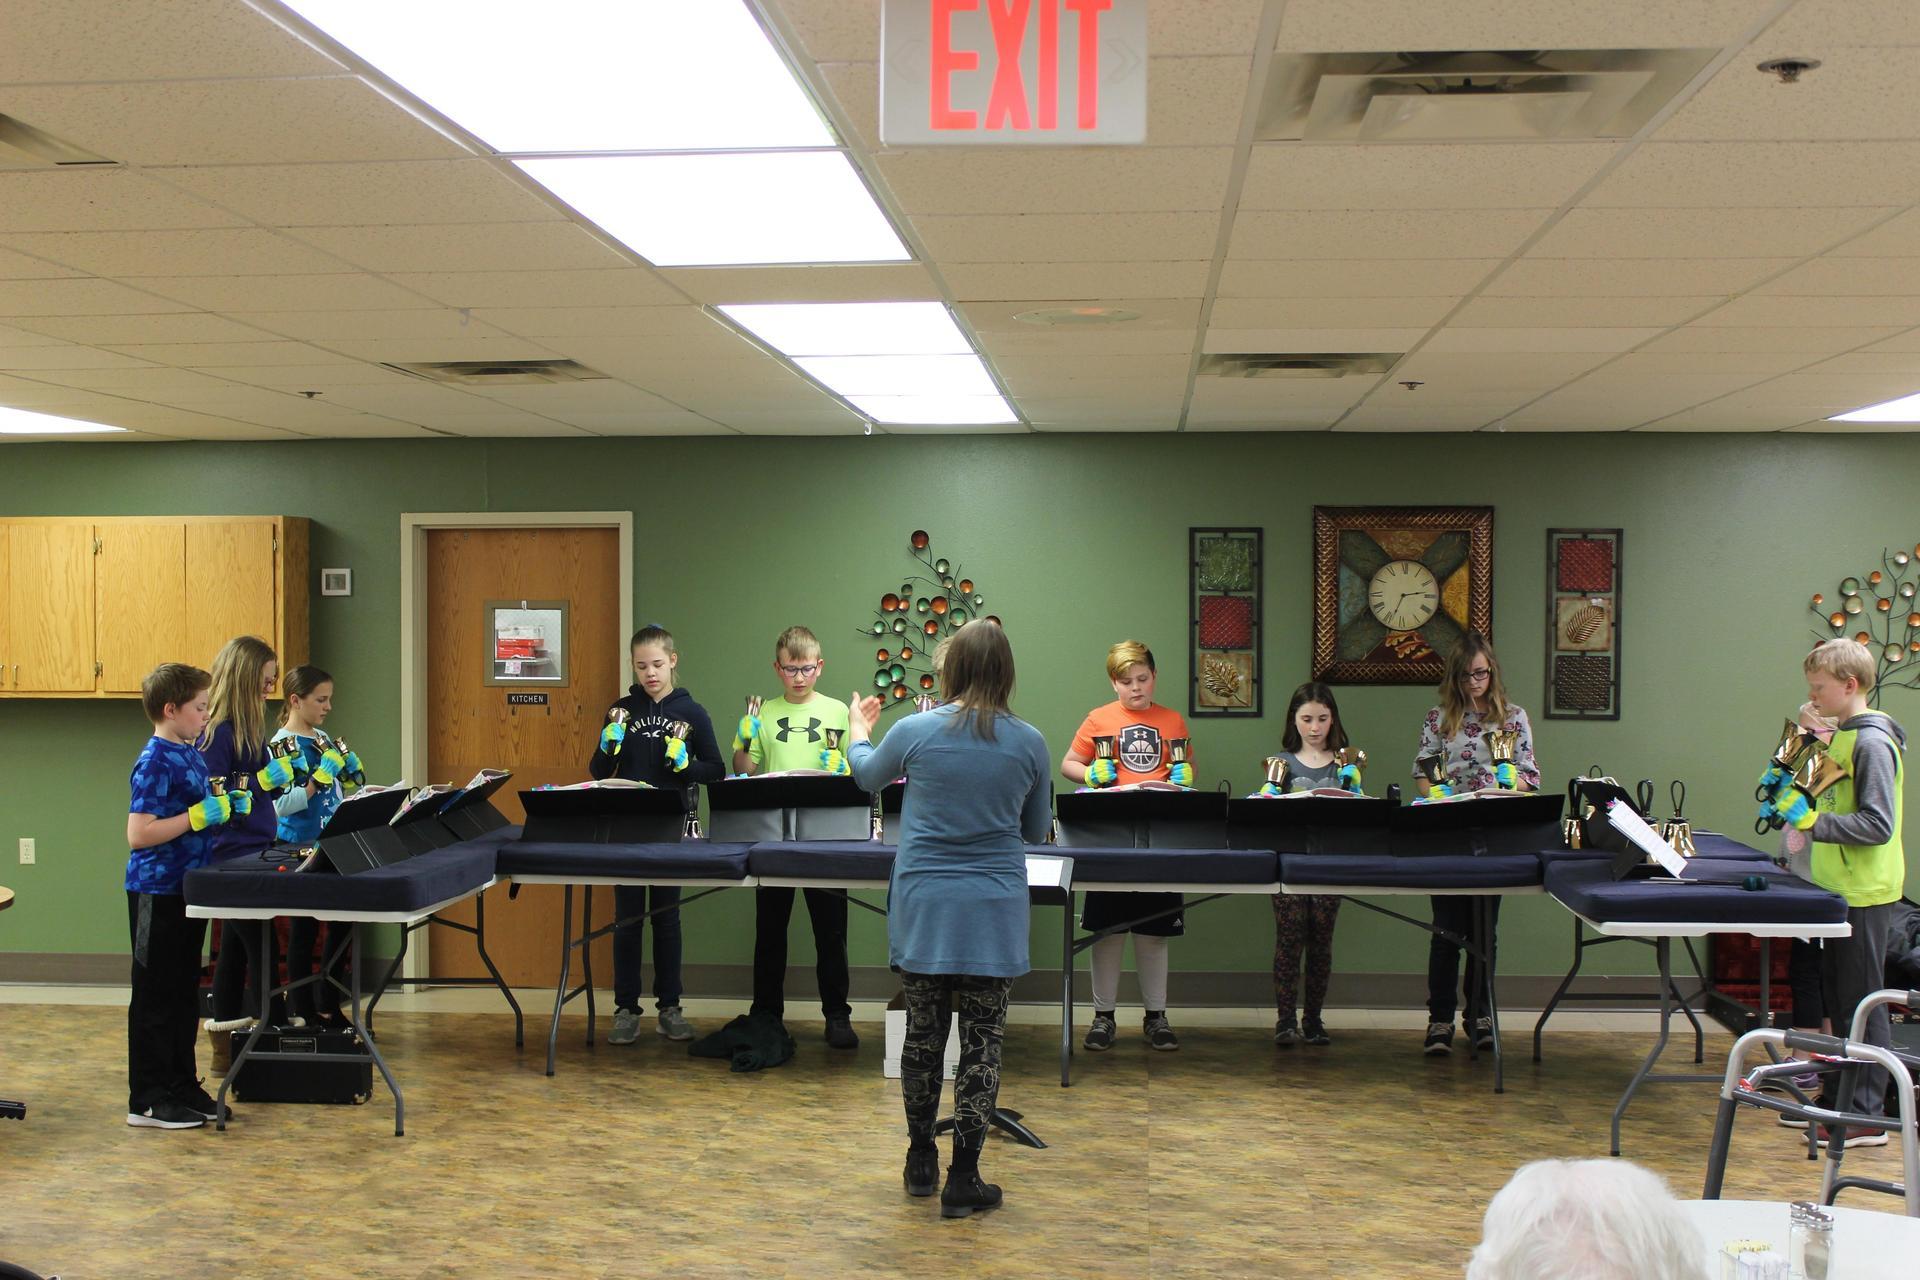 Handbell performance in community